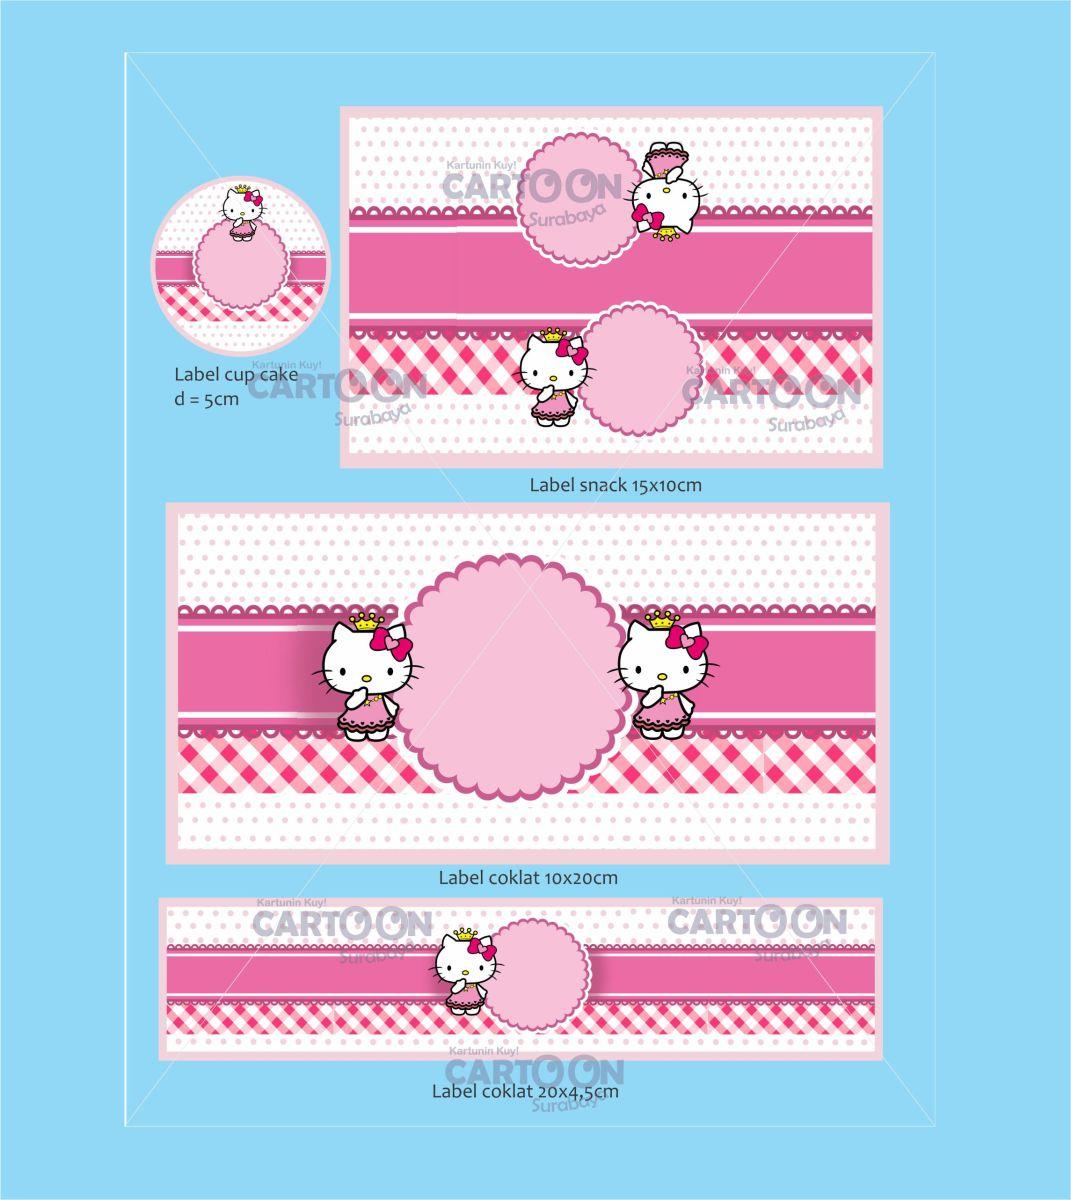 Contoh Desain Label tema Hello Kitty - Cartoon Surabaya